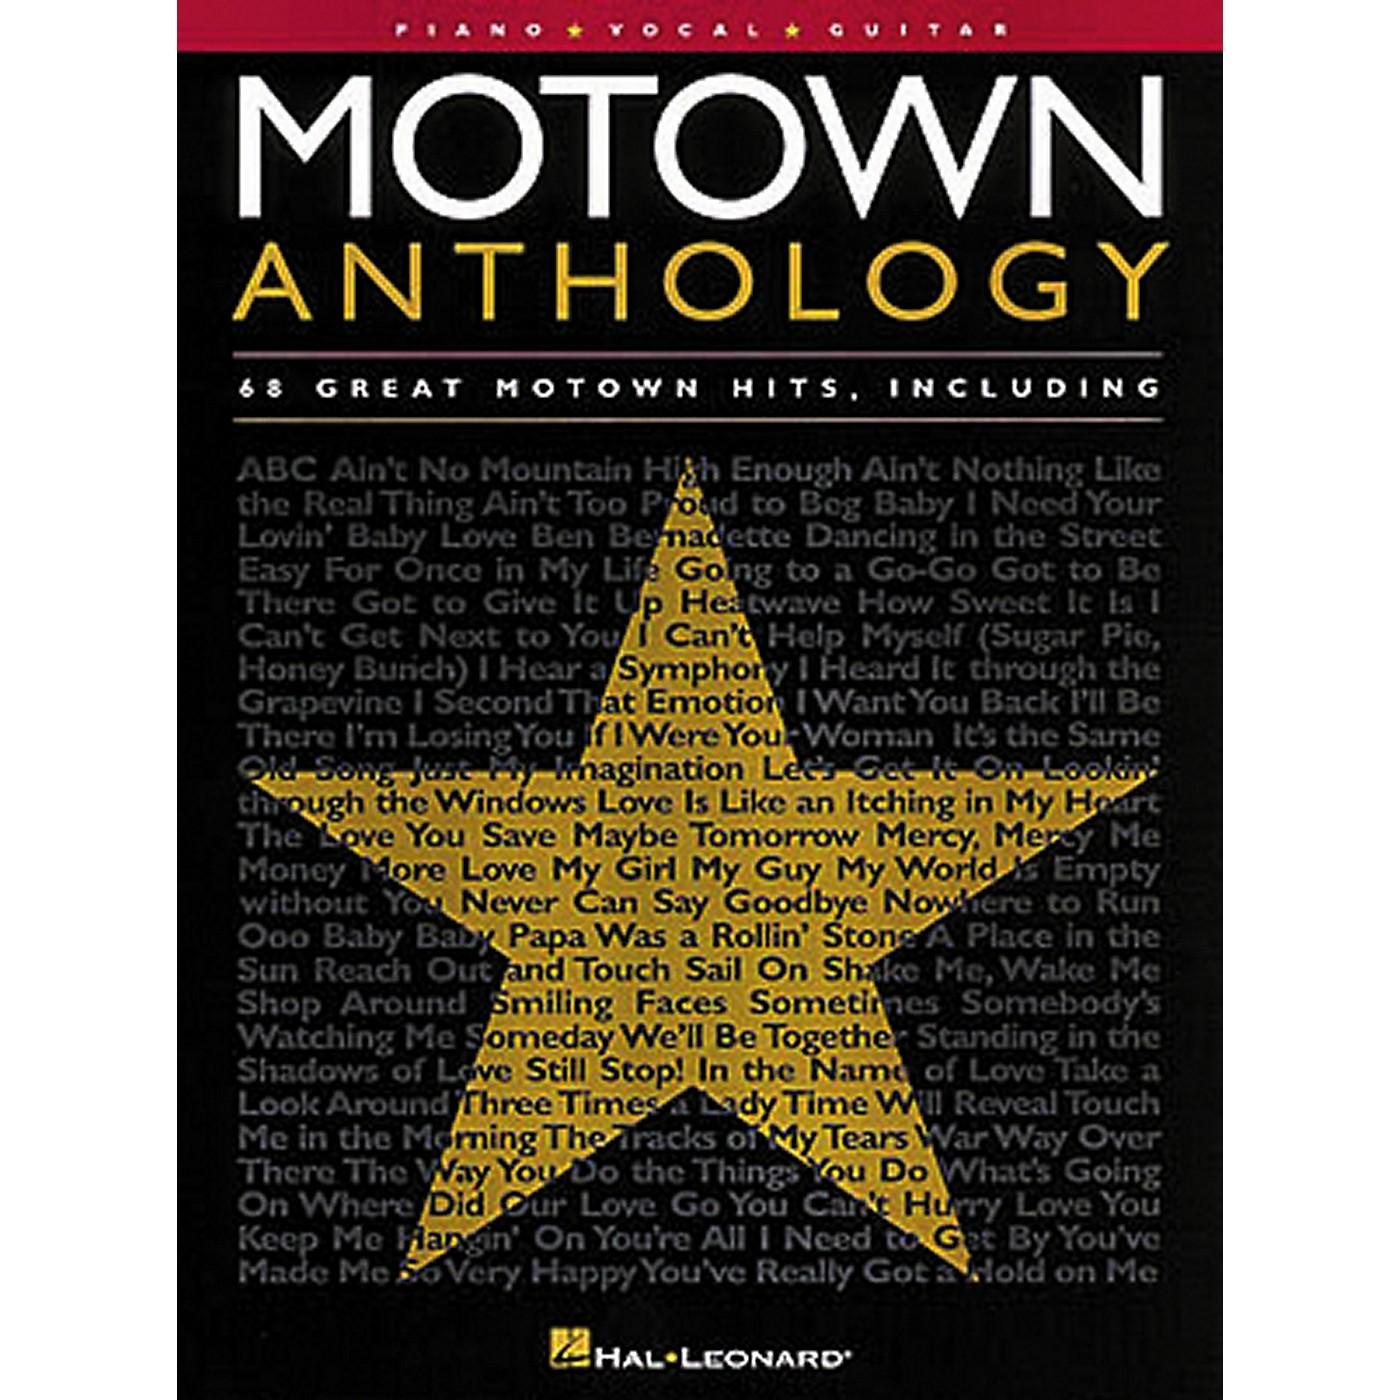 Hal Leonard Motown Anthology Piano, Vocal, Guitar Songbook thumbnail